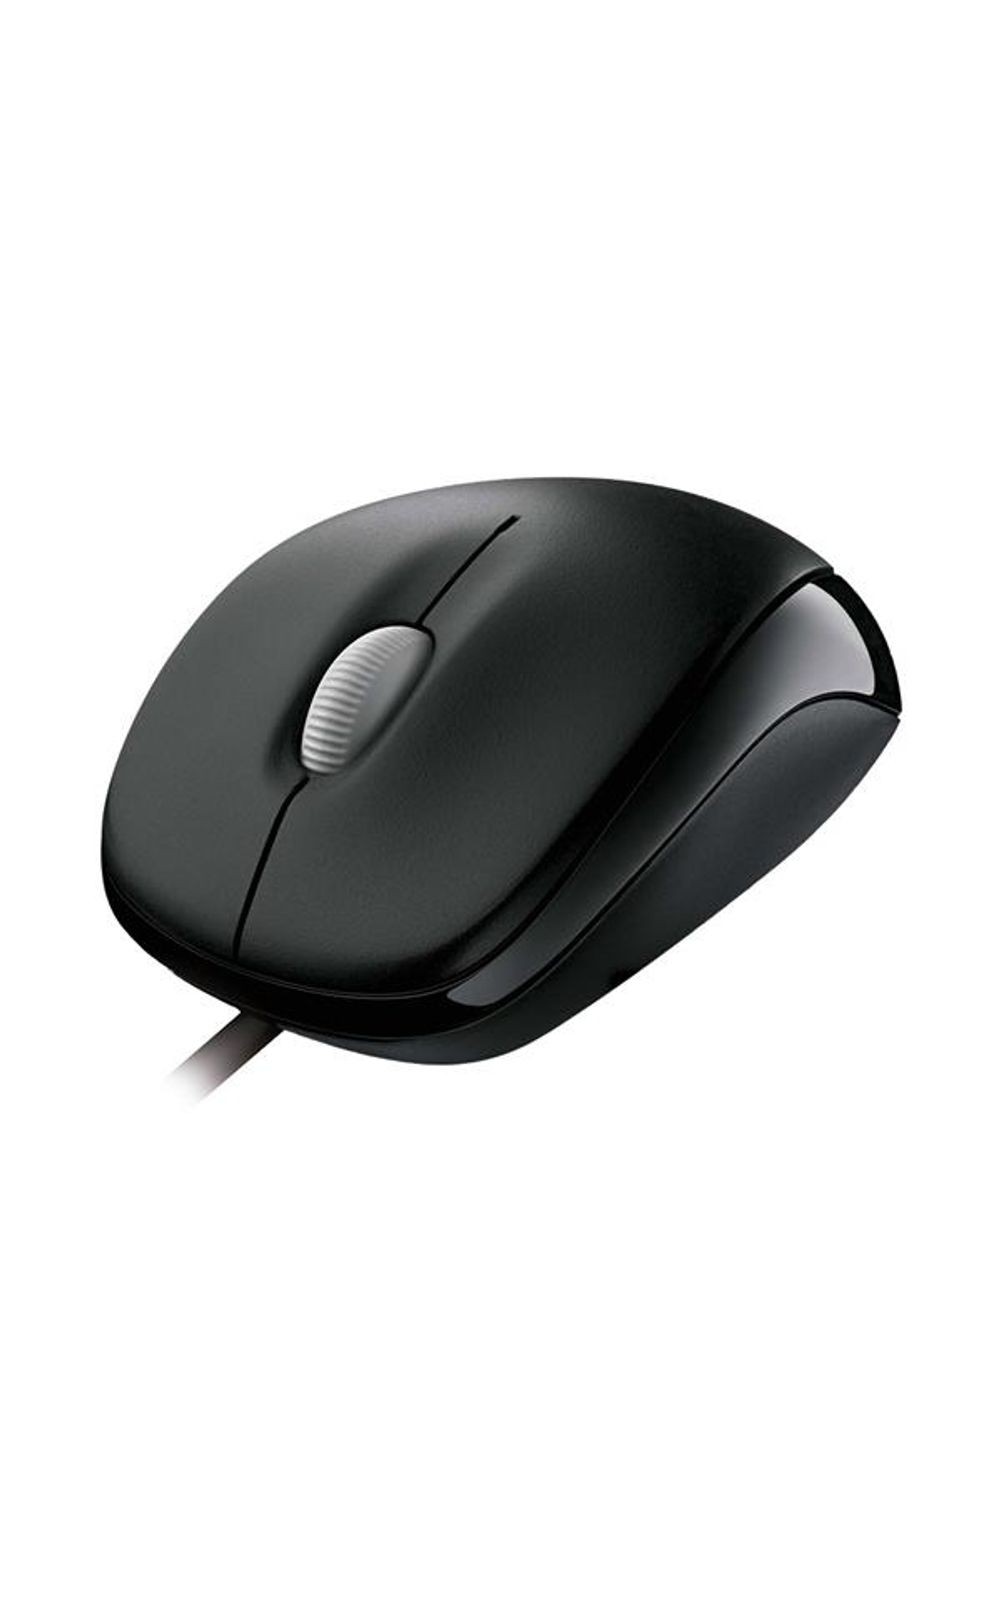 Foto 2 - Mouse Com Fio Compact Usb Preto Microsoft - U8100010